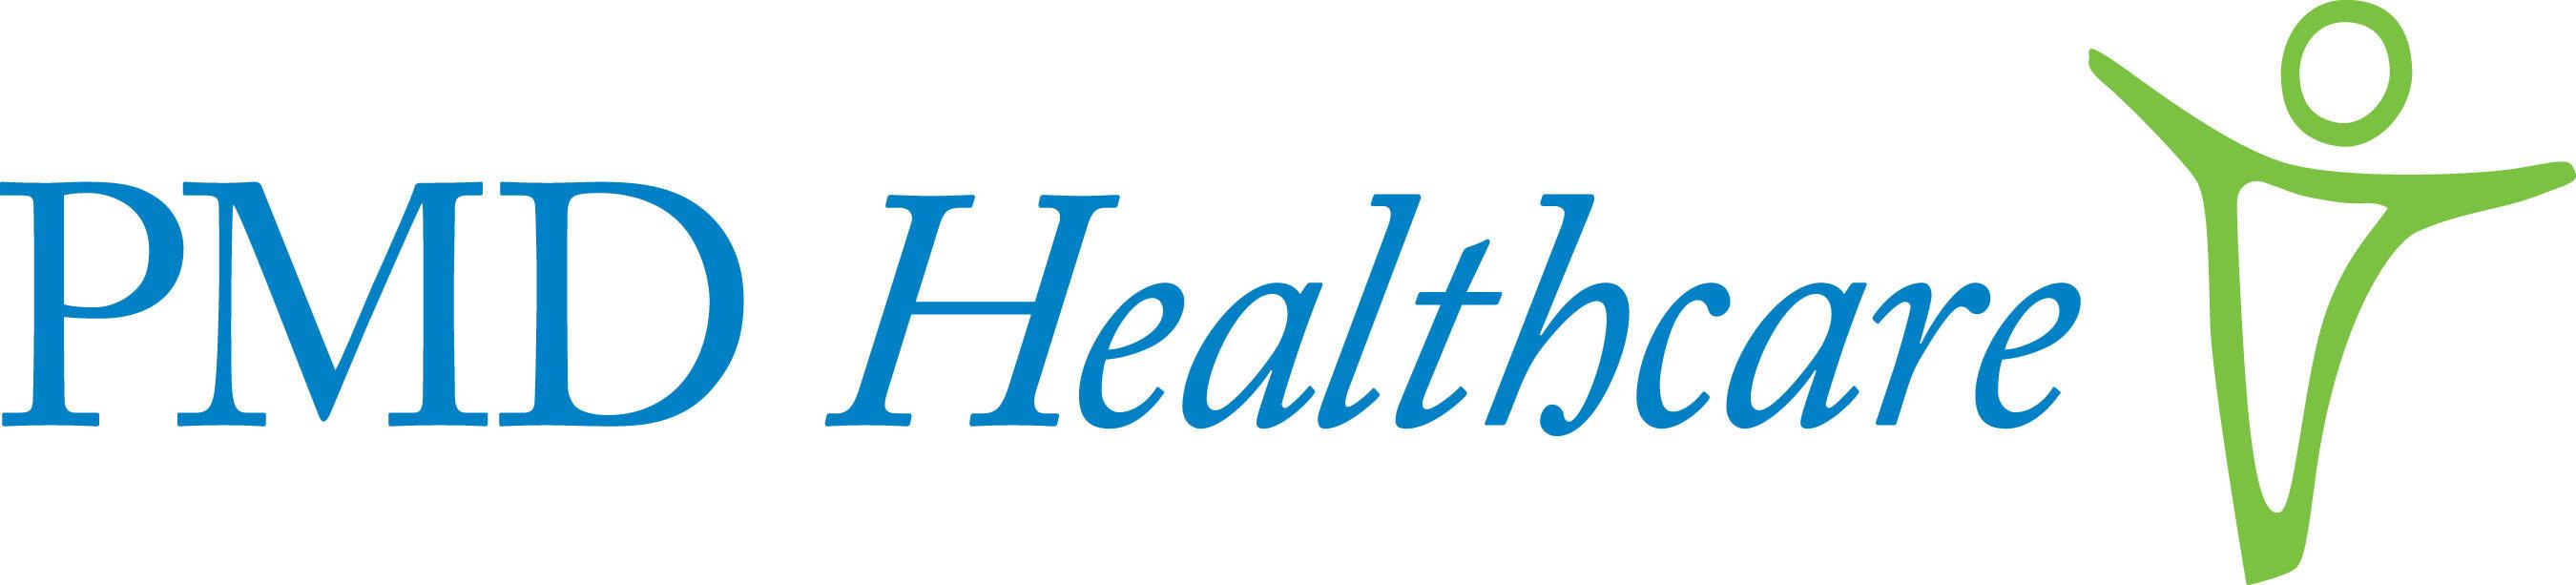 PMD Healthcare Announces Medical Advisory Board